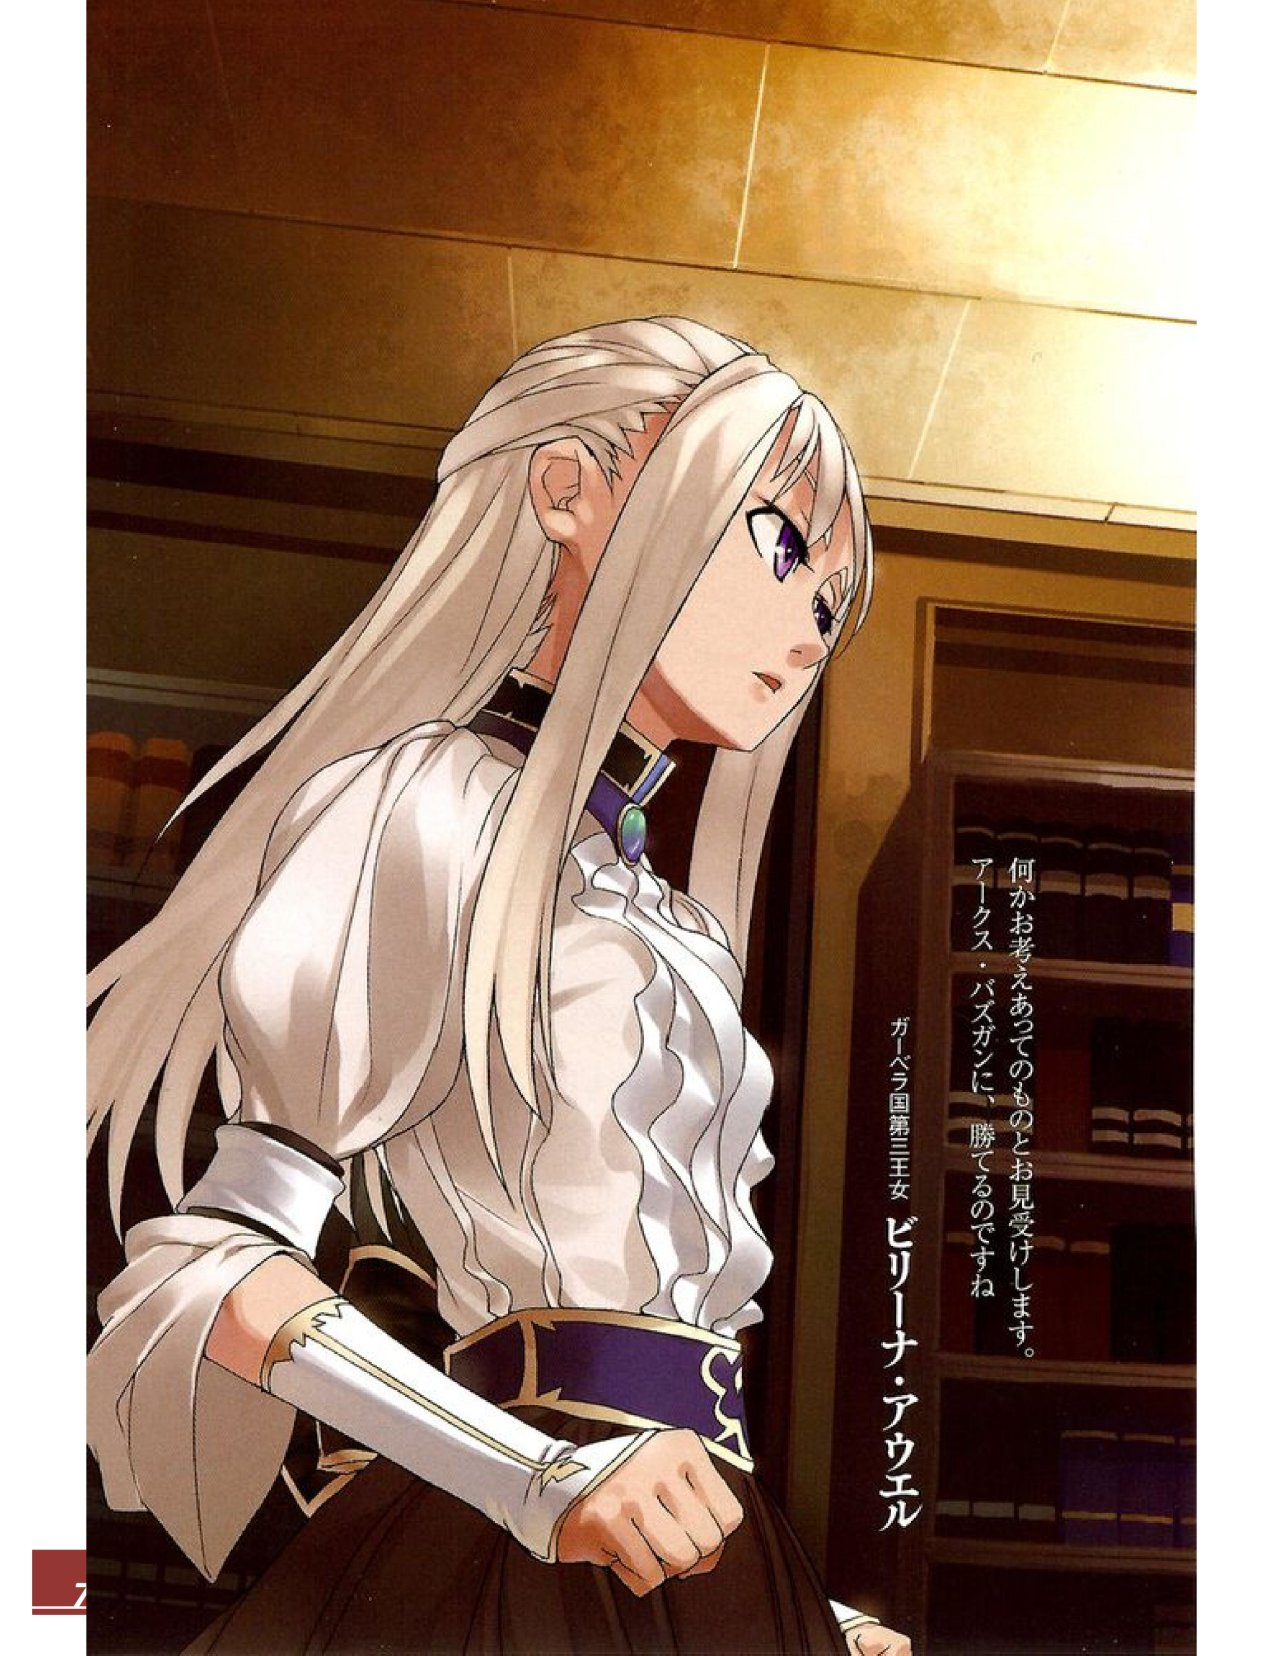 https://c9.mangatag.com/es_manga/pic5/22/25558/727844/1271b96d9055a9291ebd69ea5d0eaee1.jpg Page 7